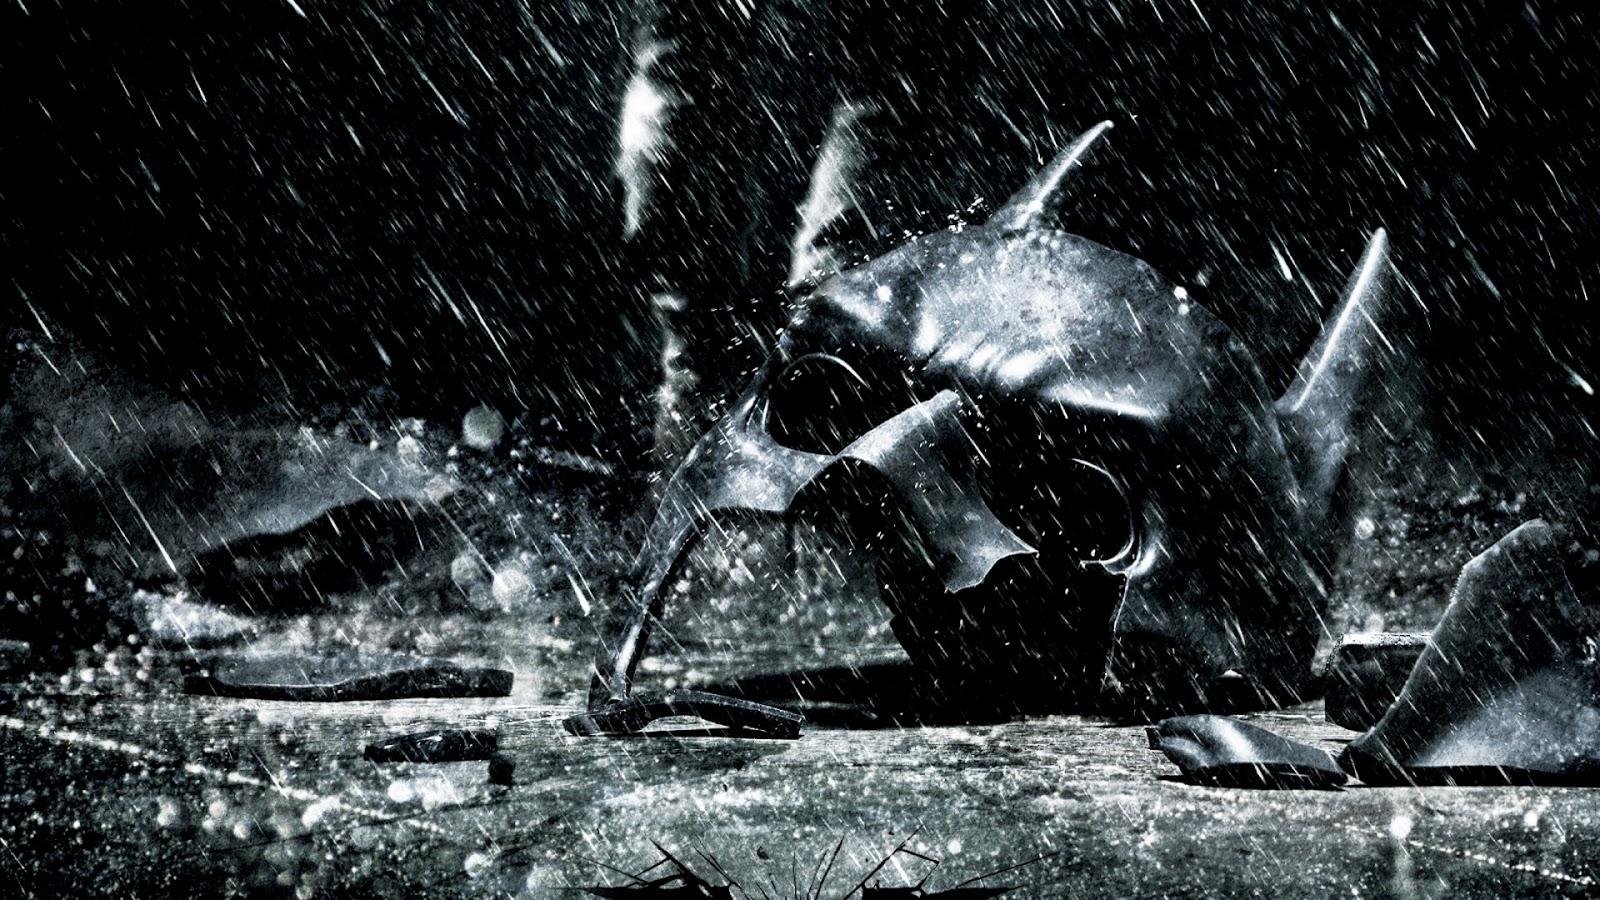 The Dark Knight Rises 02 1920x1080 New Movies Wallpapers 1600x900